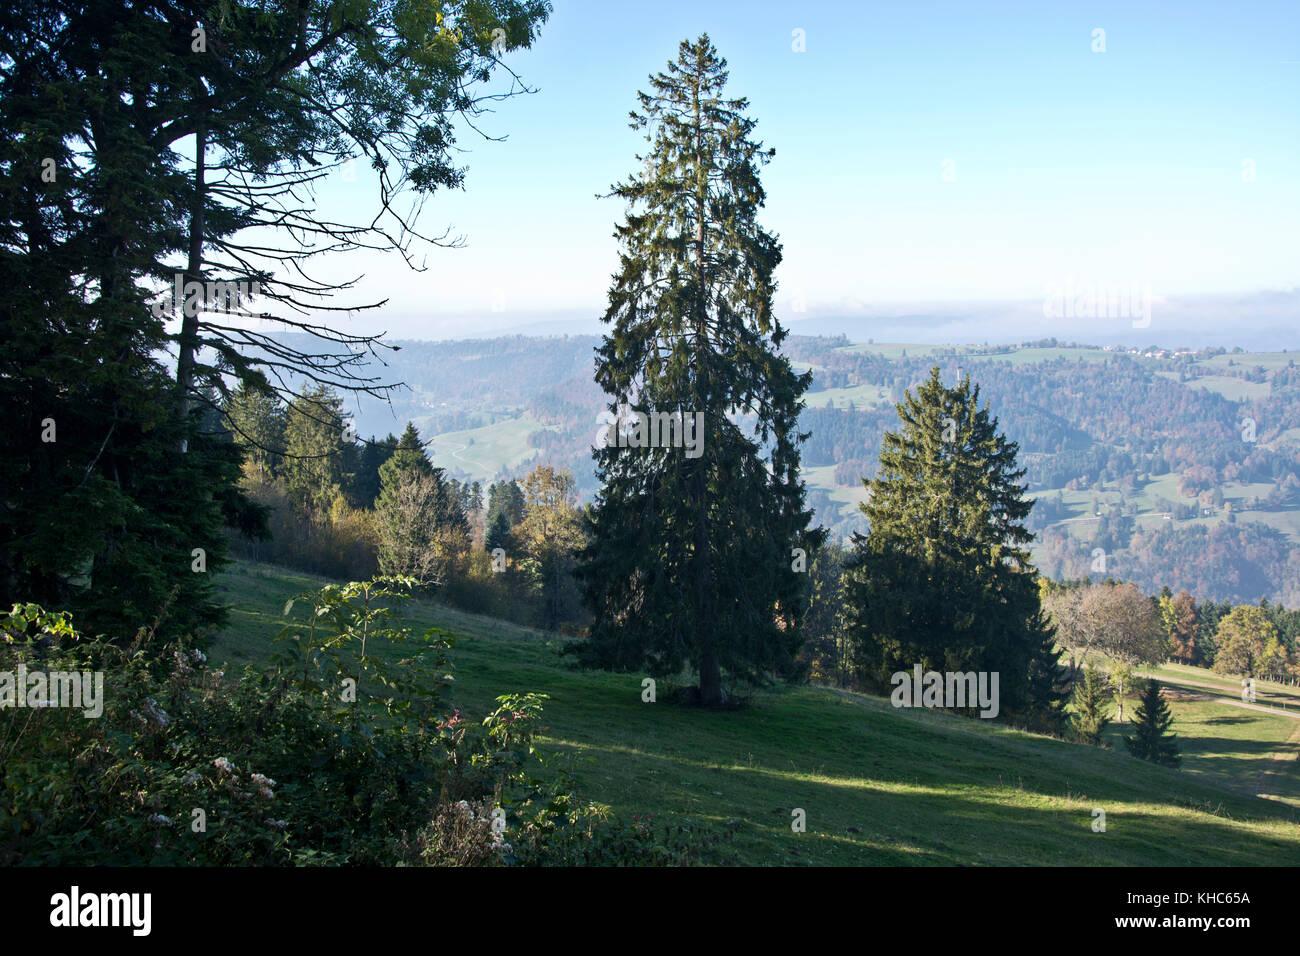 view over clos du doubs *** Local Caption *** switzerland, jura, franches montagnes, view, clos du doubs, valley, - Stock Image